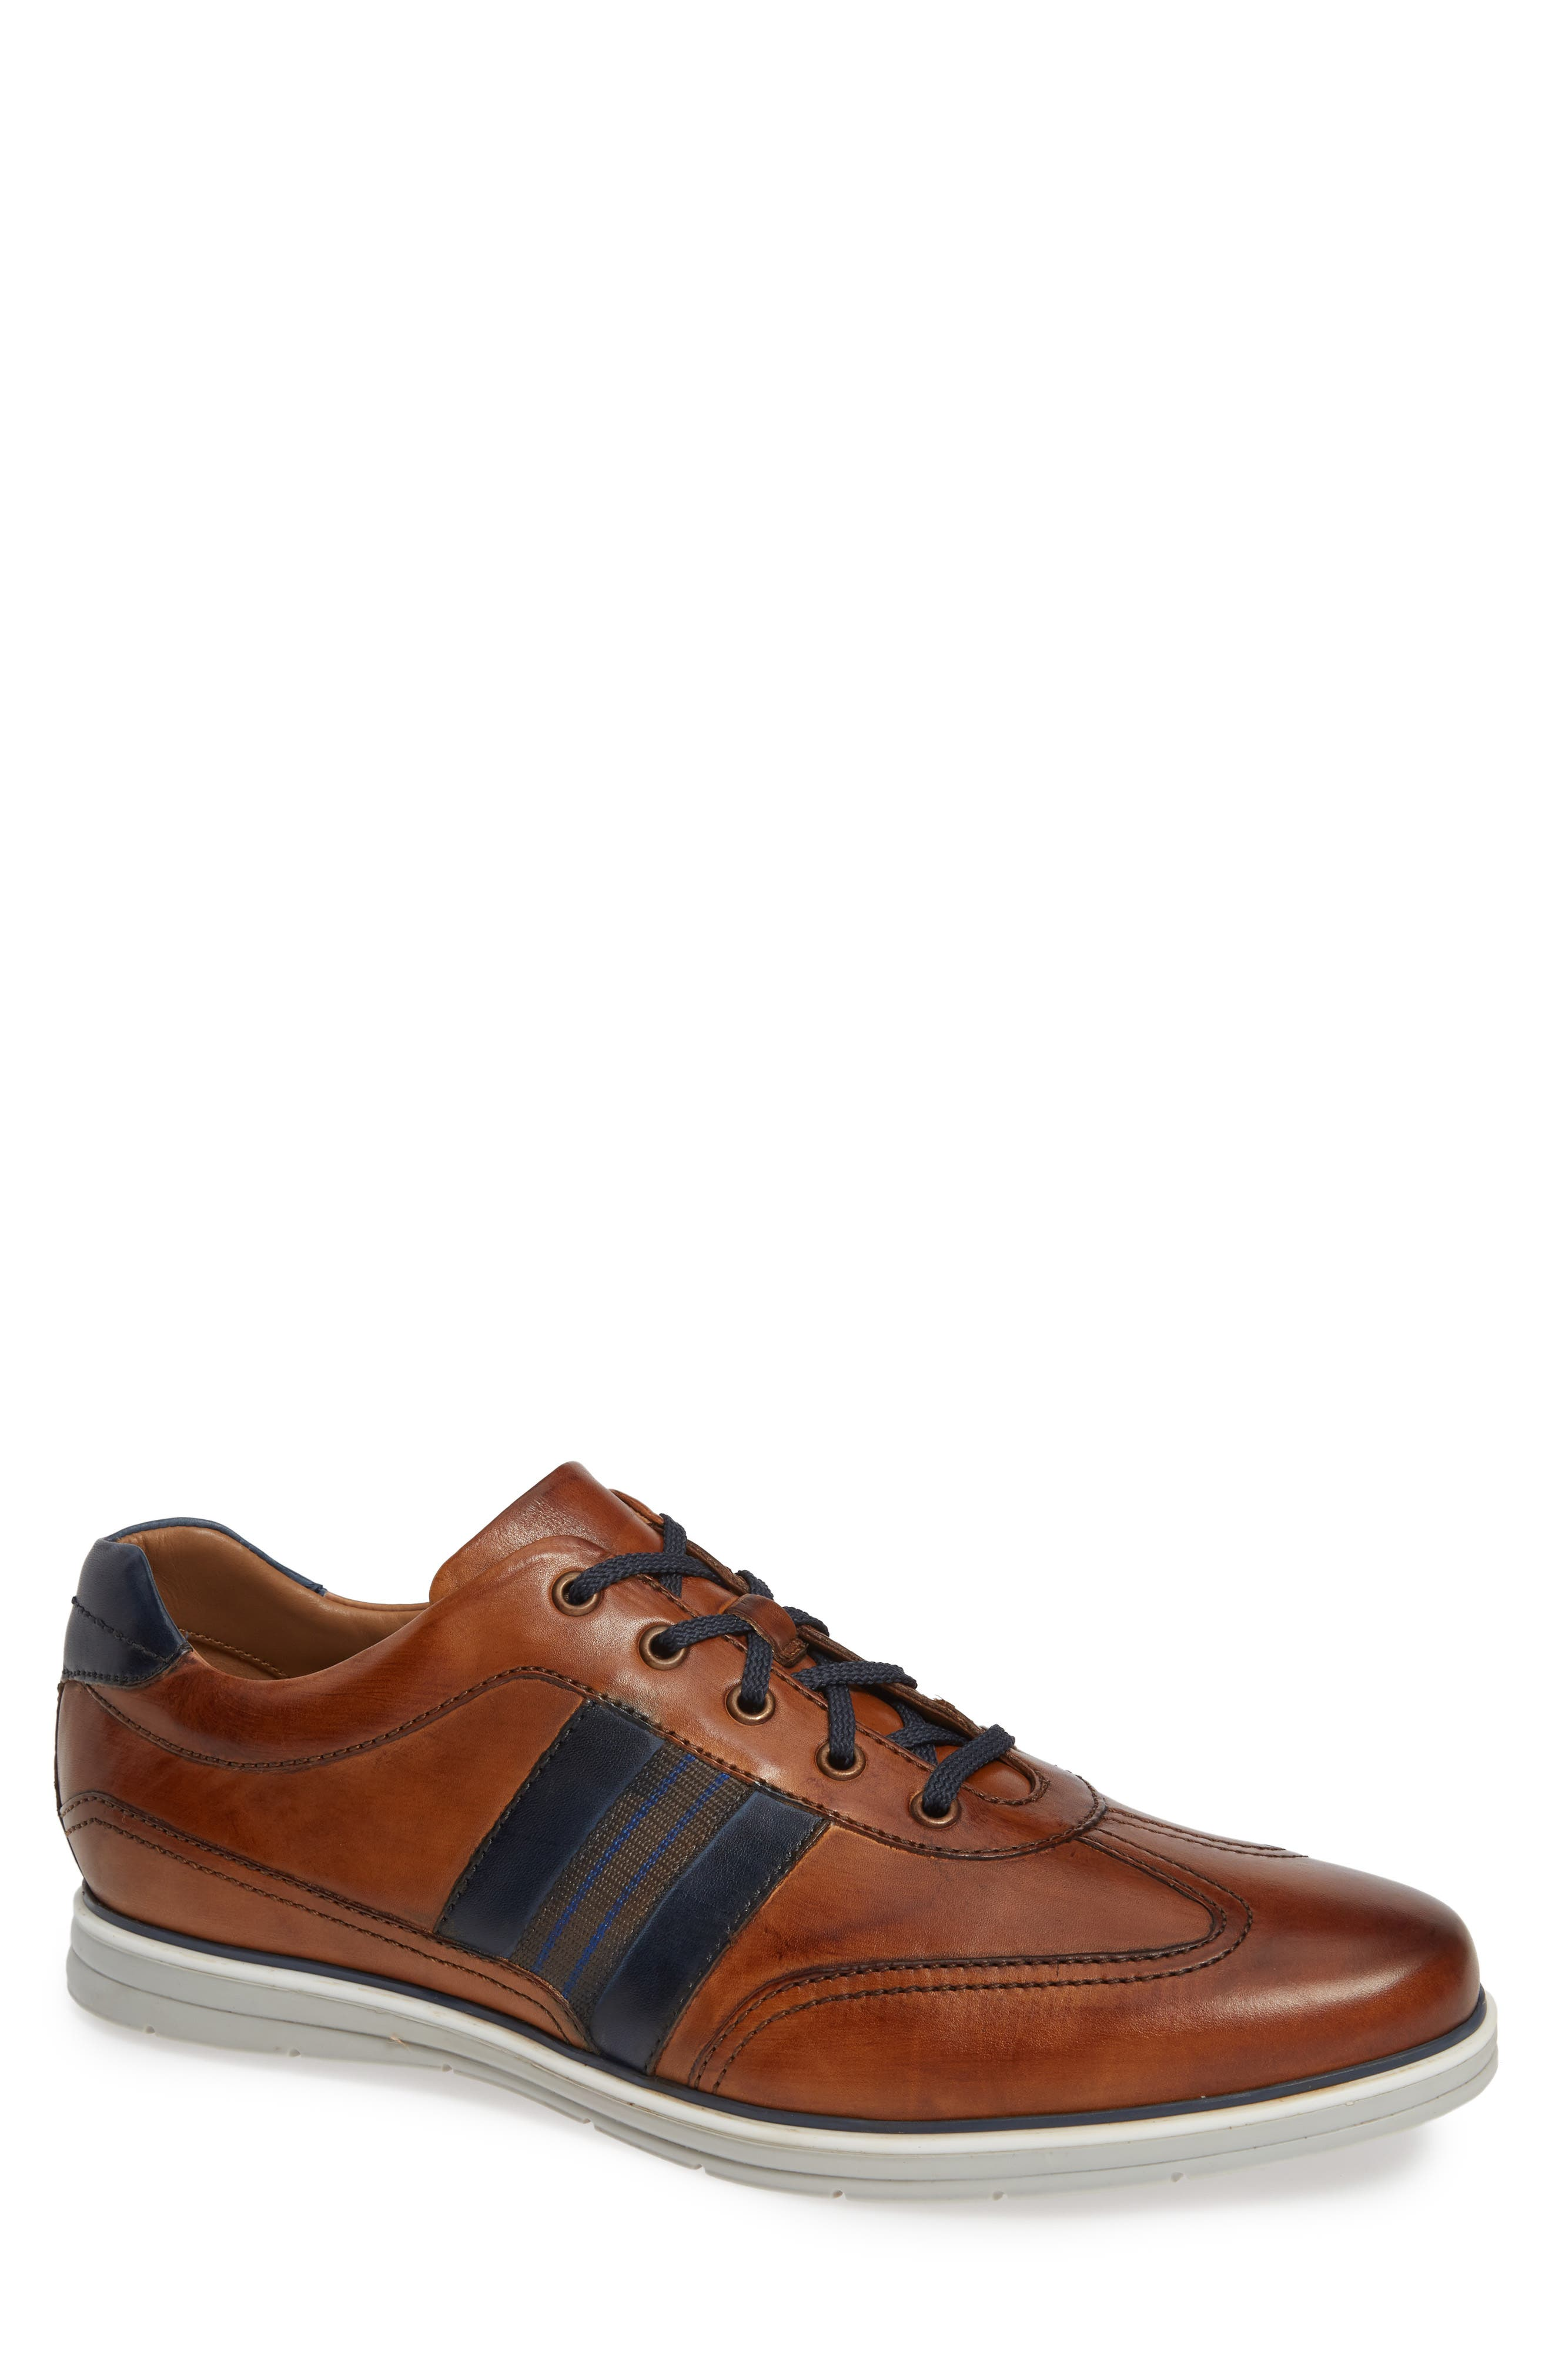 Turbo Low Top Sneaker,                         Main,                         color, COGNAC LEATHER